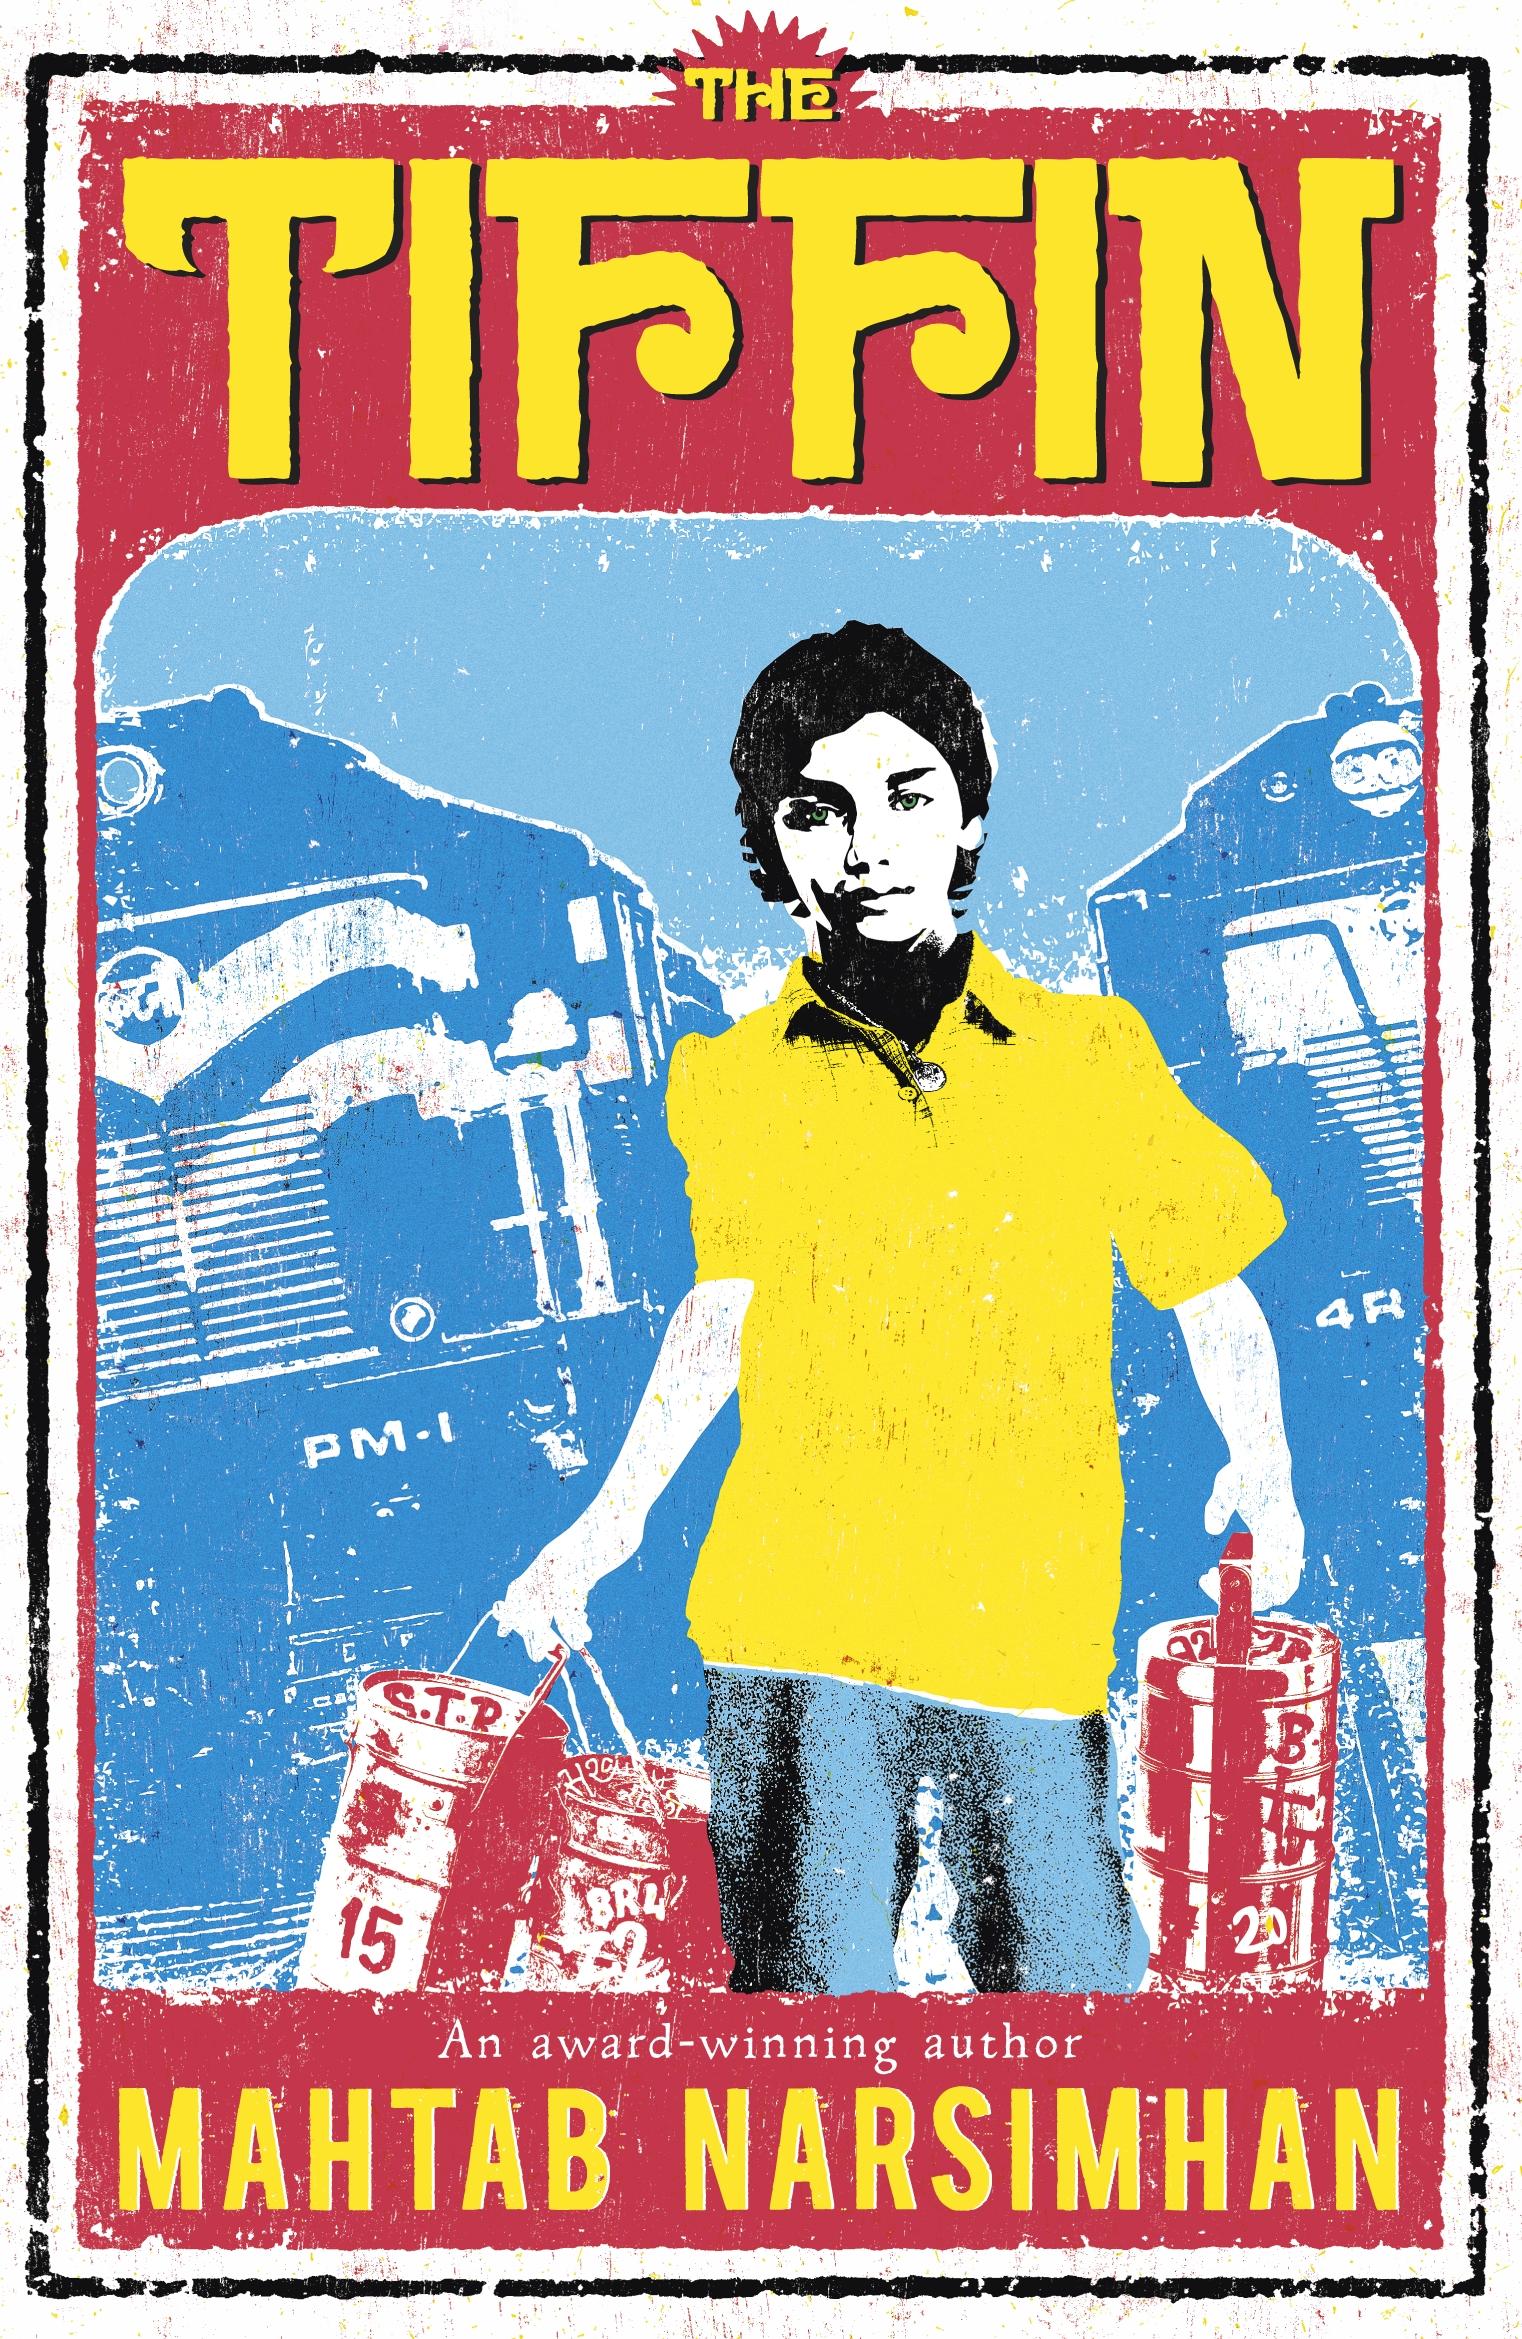 The Tiffin by Mahtab Narsimhan